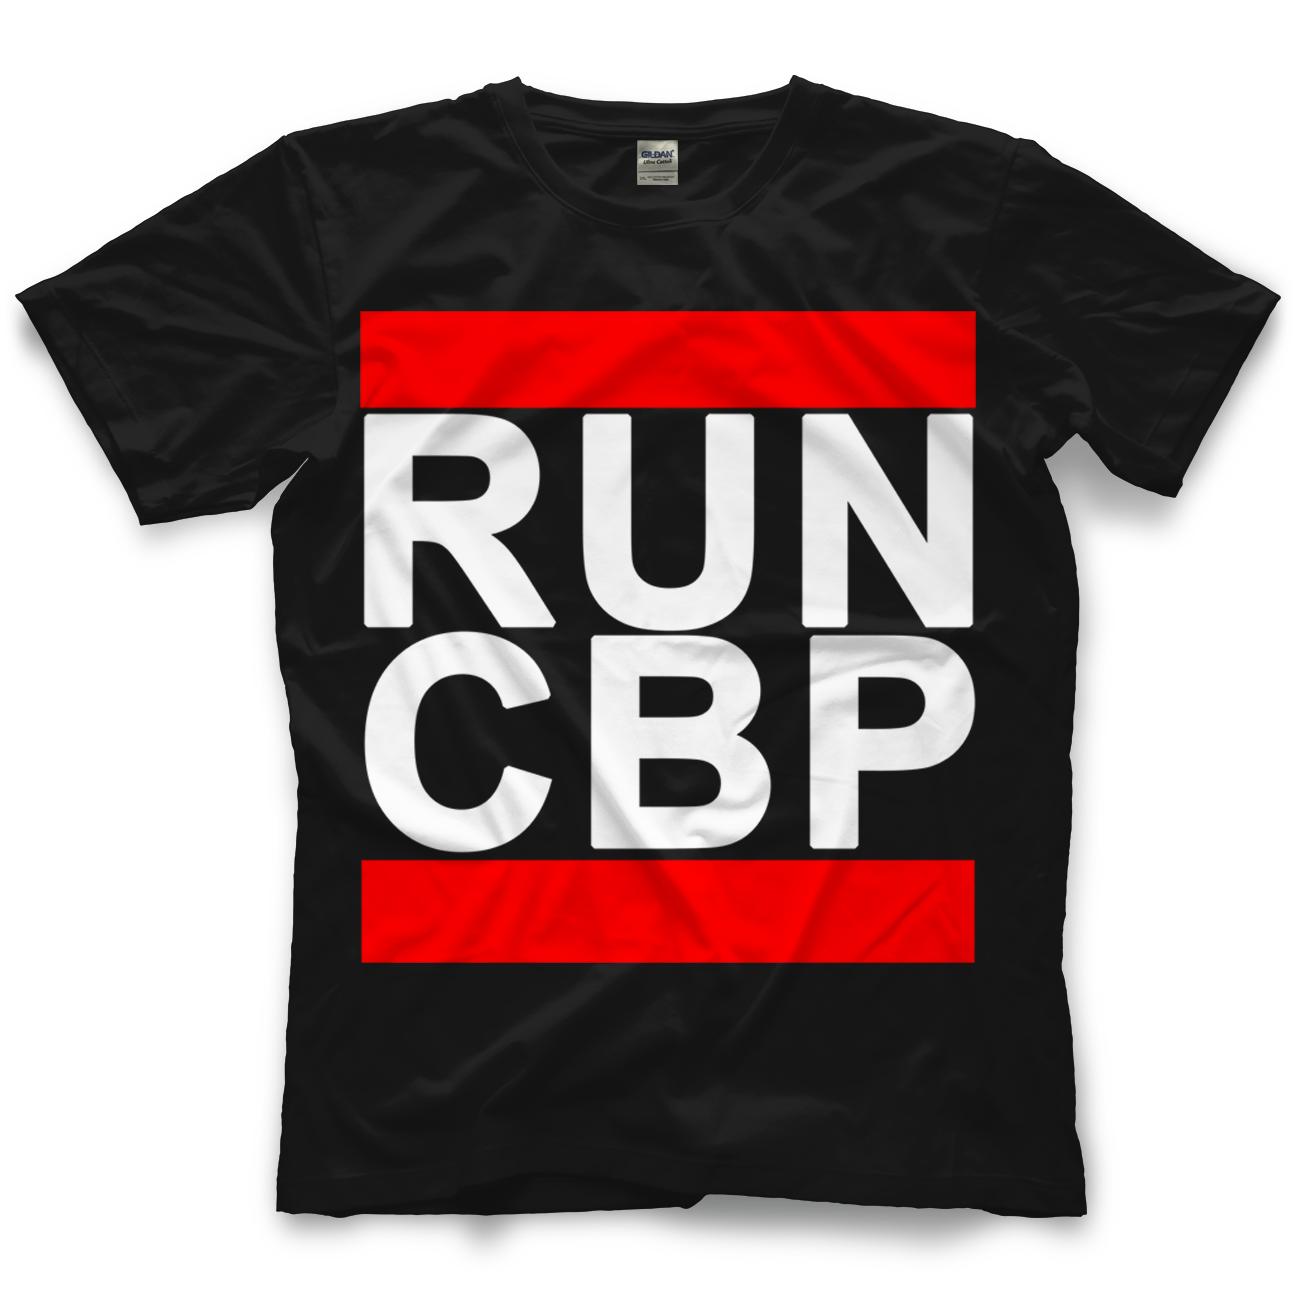 Cbp Nation Run Cbp T Shirt